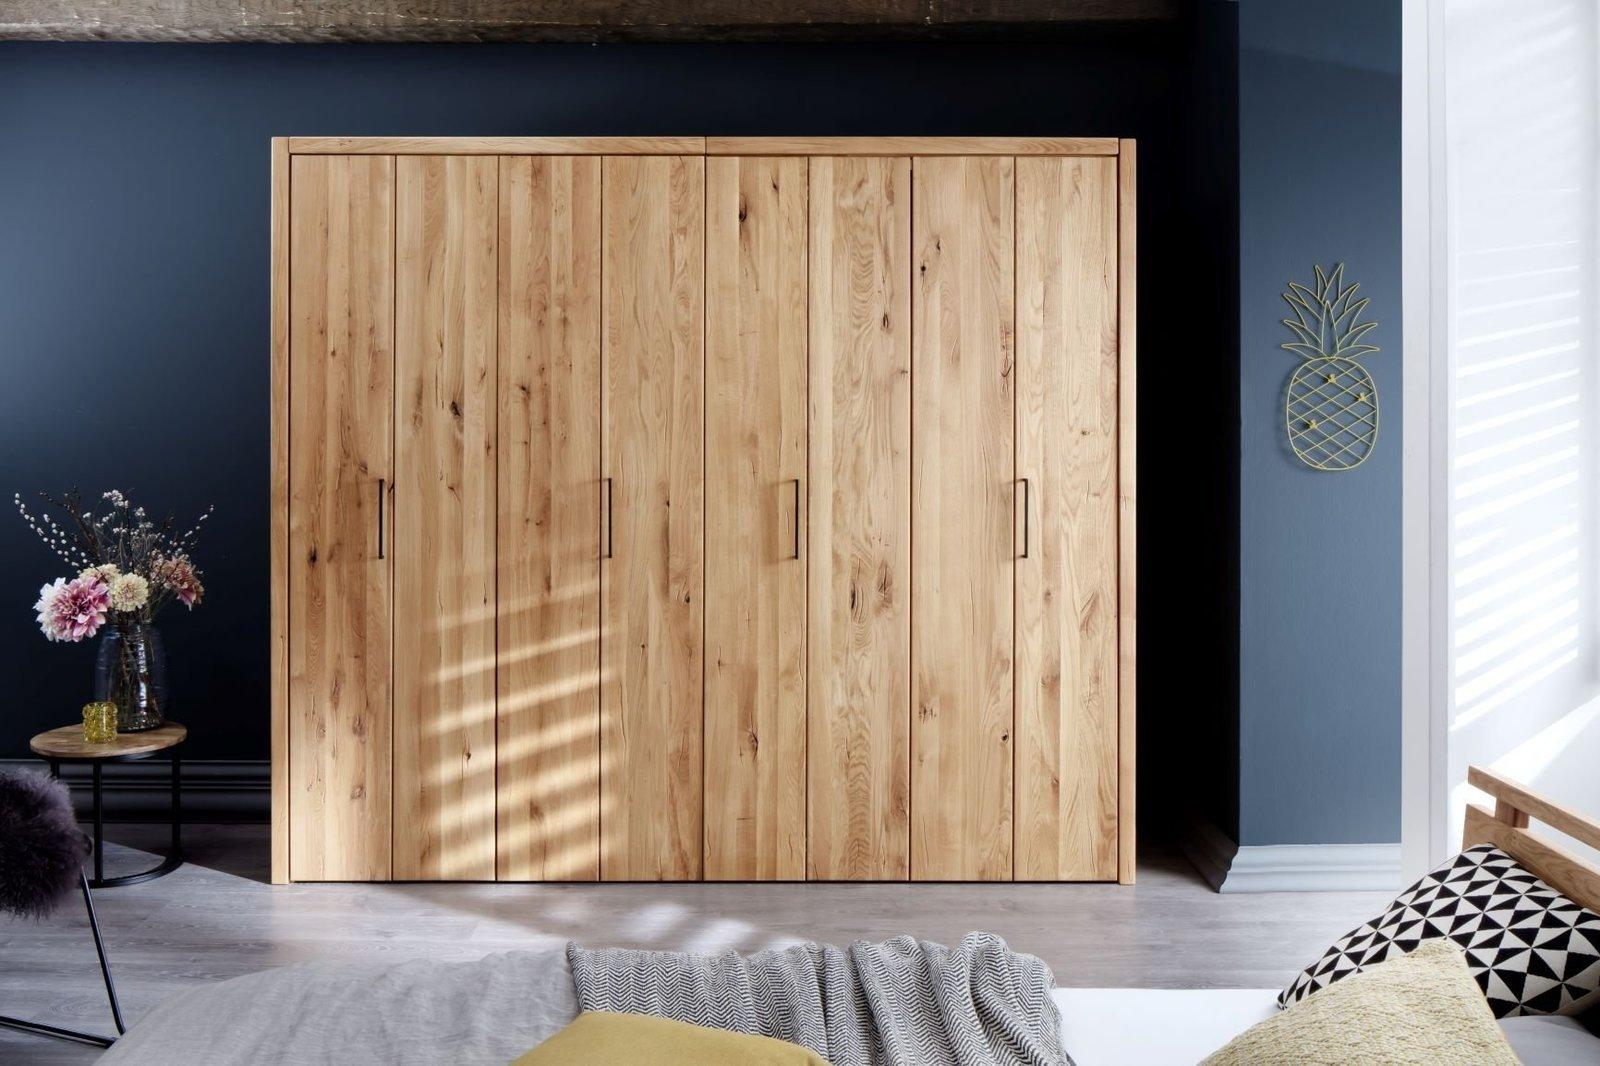 Massivholz Schlafzimmer Ditte, Bild 2